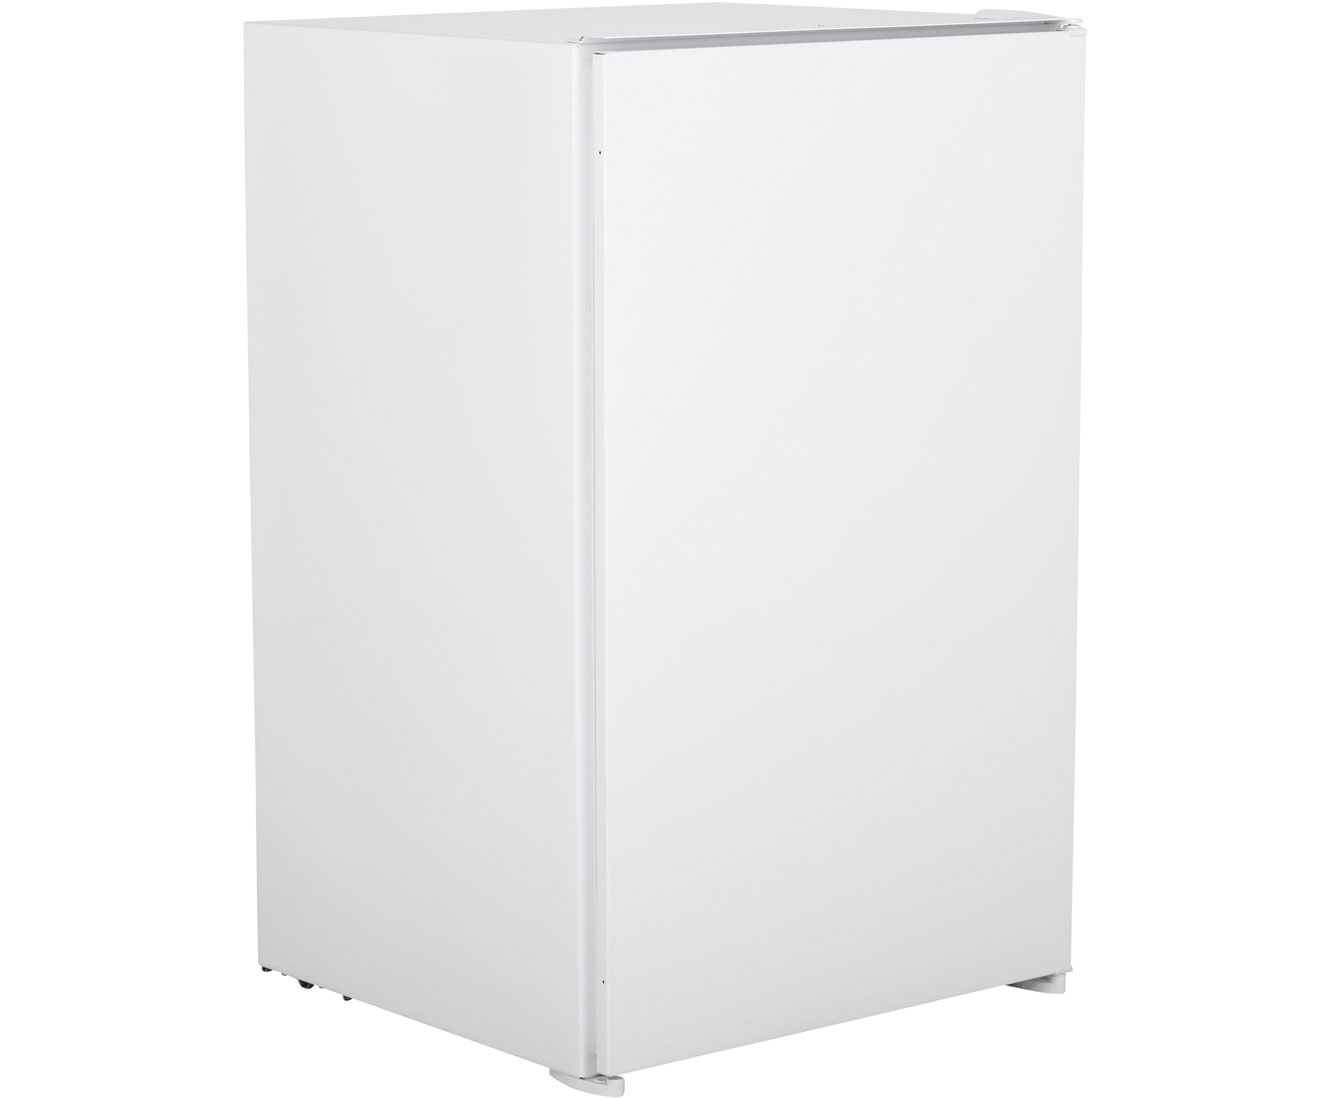 Aeg Kühlschrank Rtb91531aw : Aeg kühlschrank rtb91531aw a 85 cm hoch: aeg kühlschrank rtb ax in